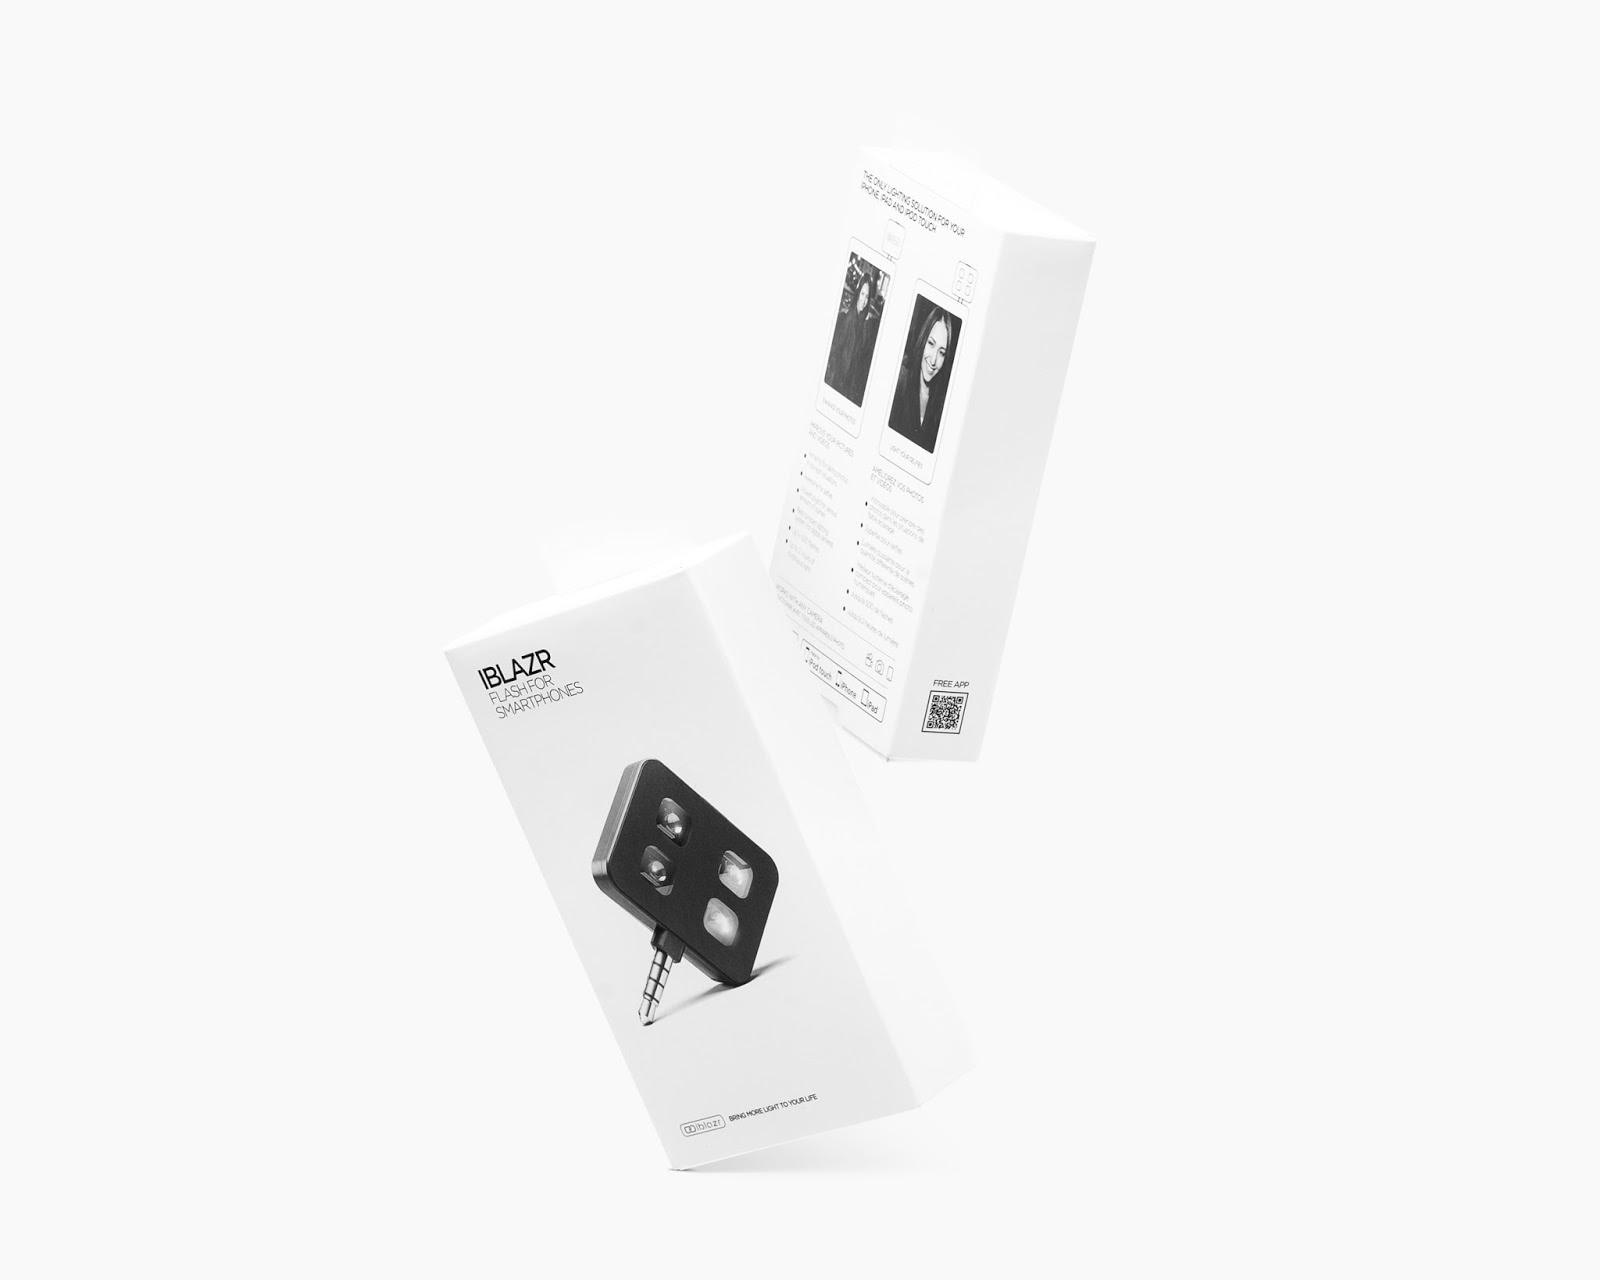 iBlazr 手机线材包装